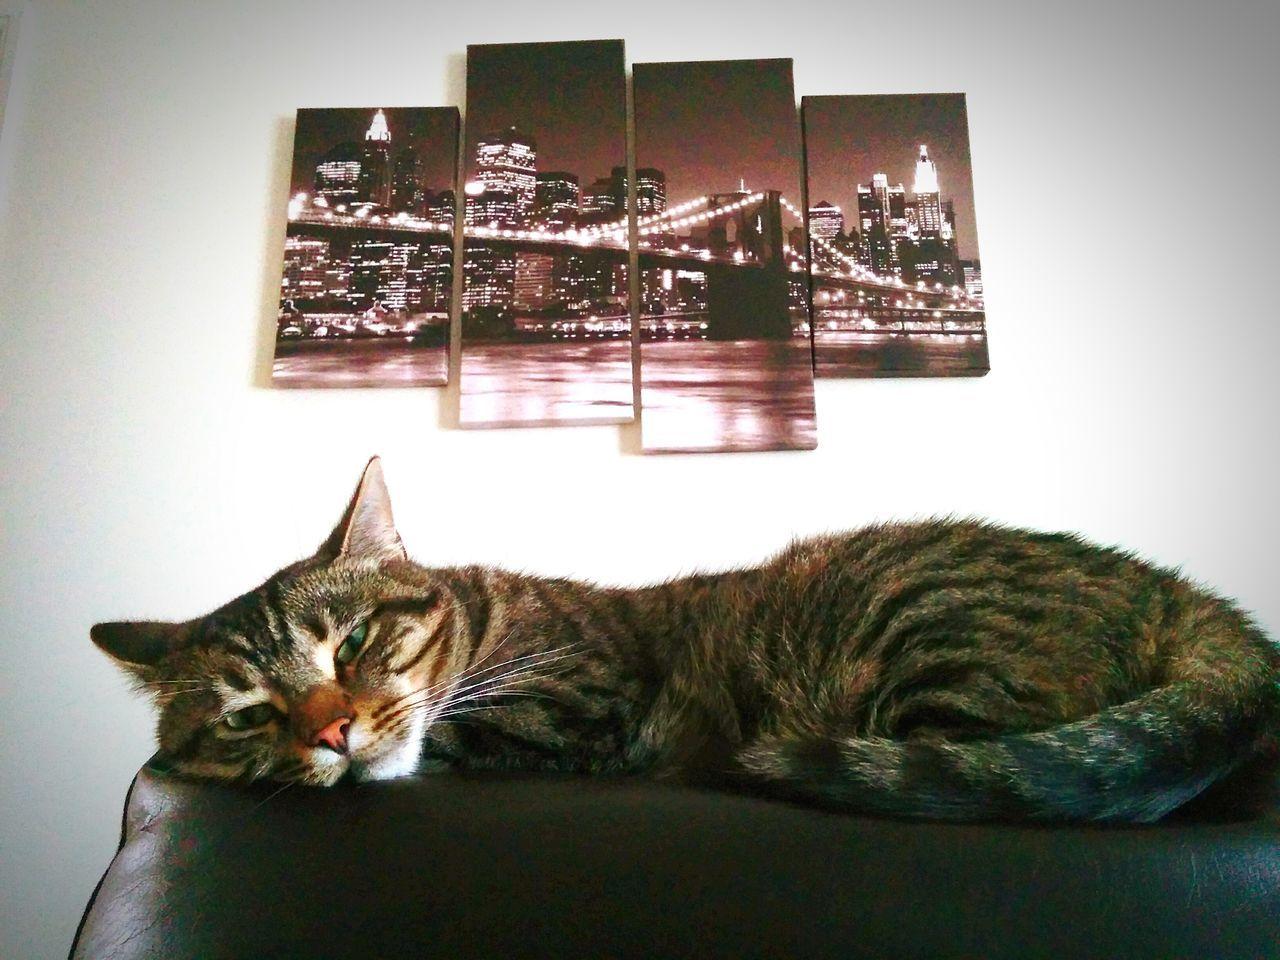 domestic cat, domestic animals, animal themes, pets, feline, one animal, mammal, cat, indoors, relaxation, sitting, no people, home interior, illuminated, night